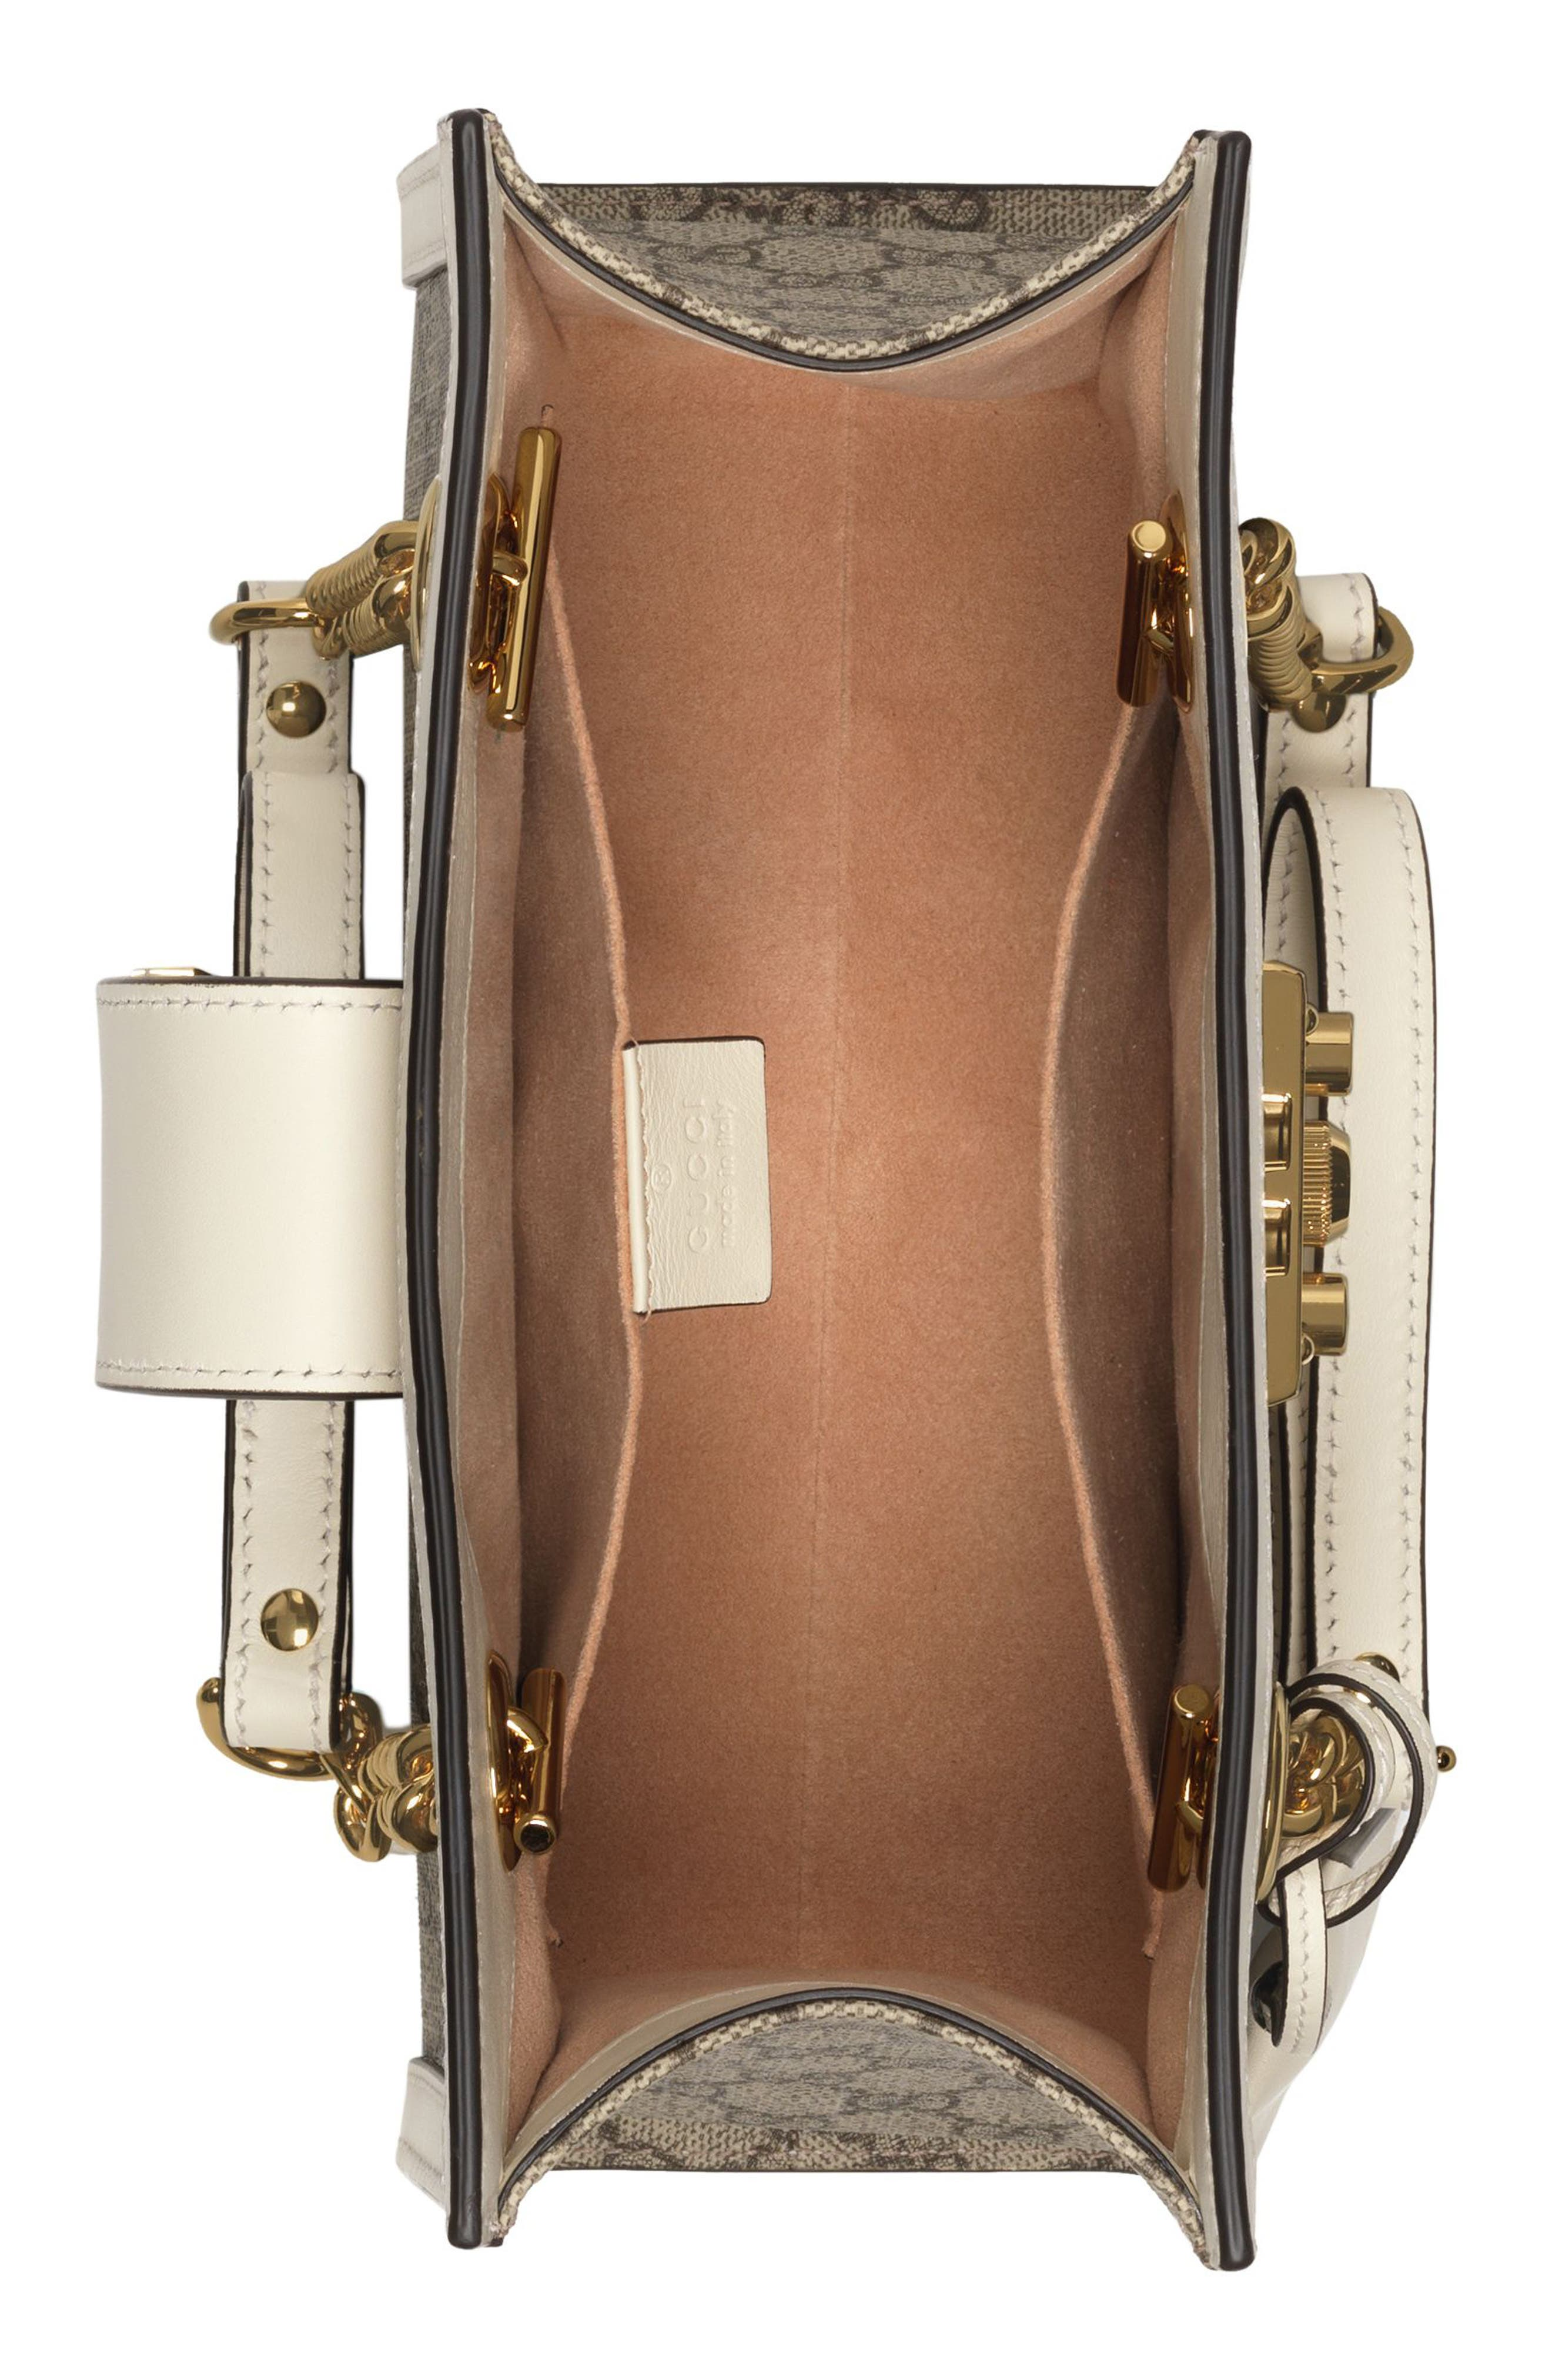 Small Padlock GG Supreme Shoulder Bag,                             Alternate thumbnail 3, color,                             BEIGE EBONY/ MYSTIC WHITE